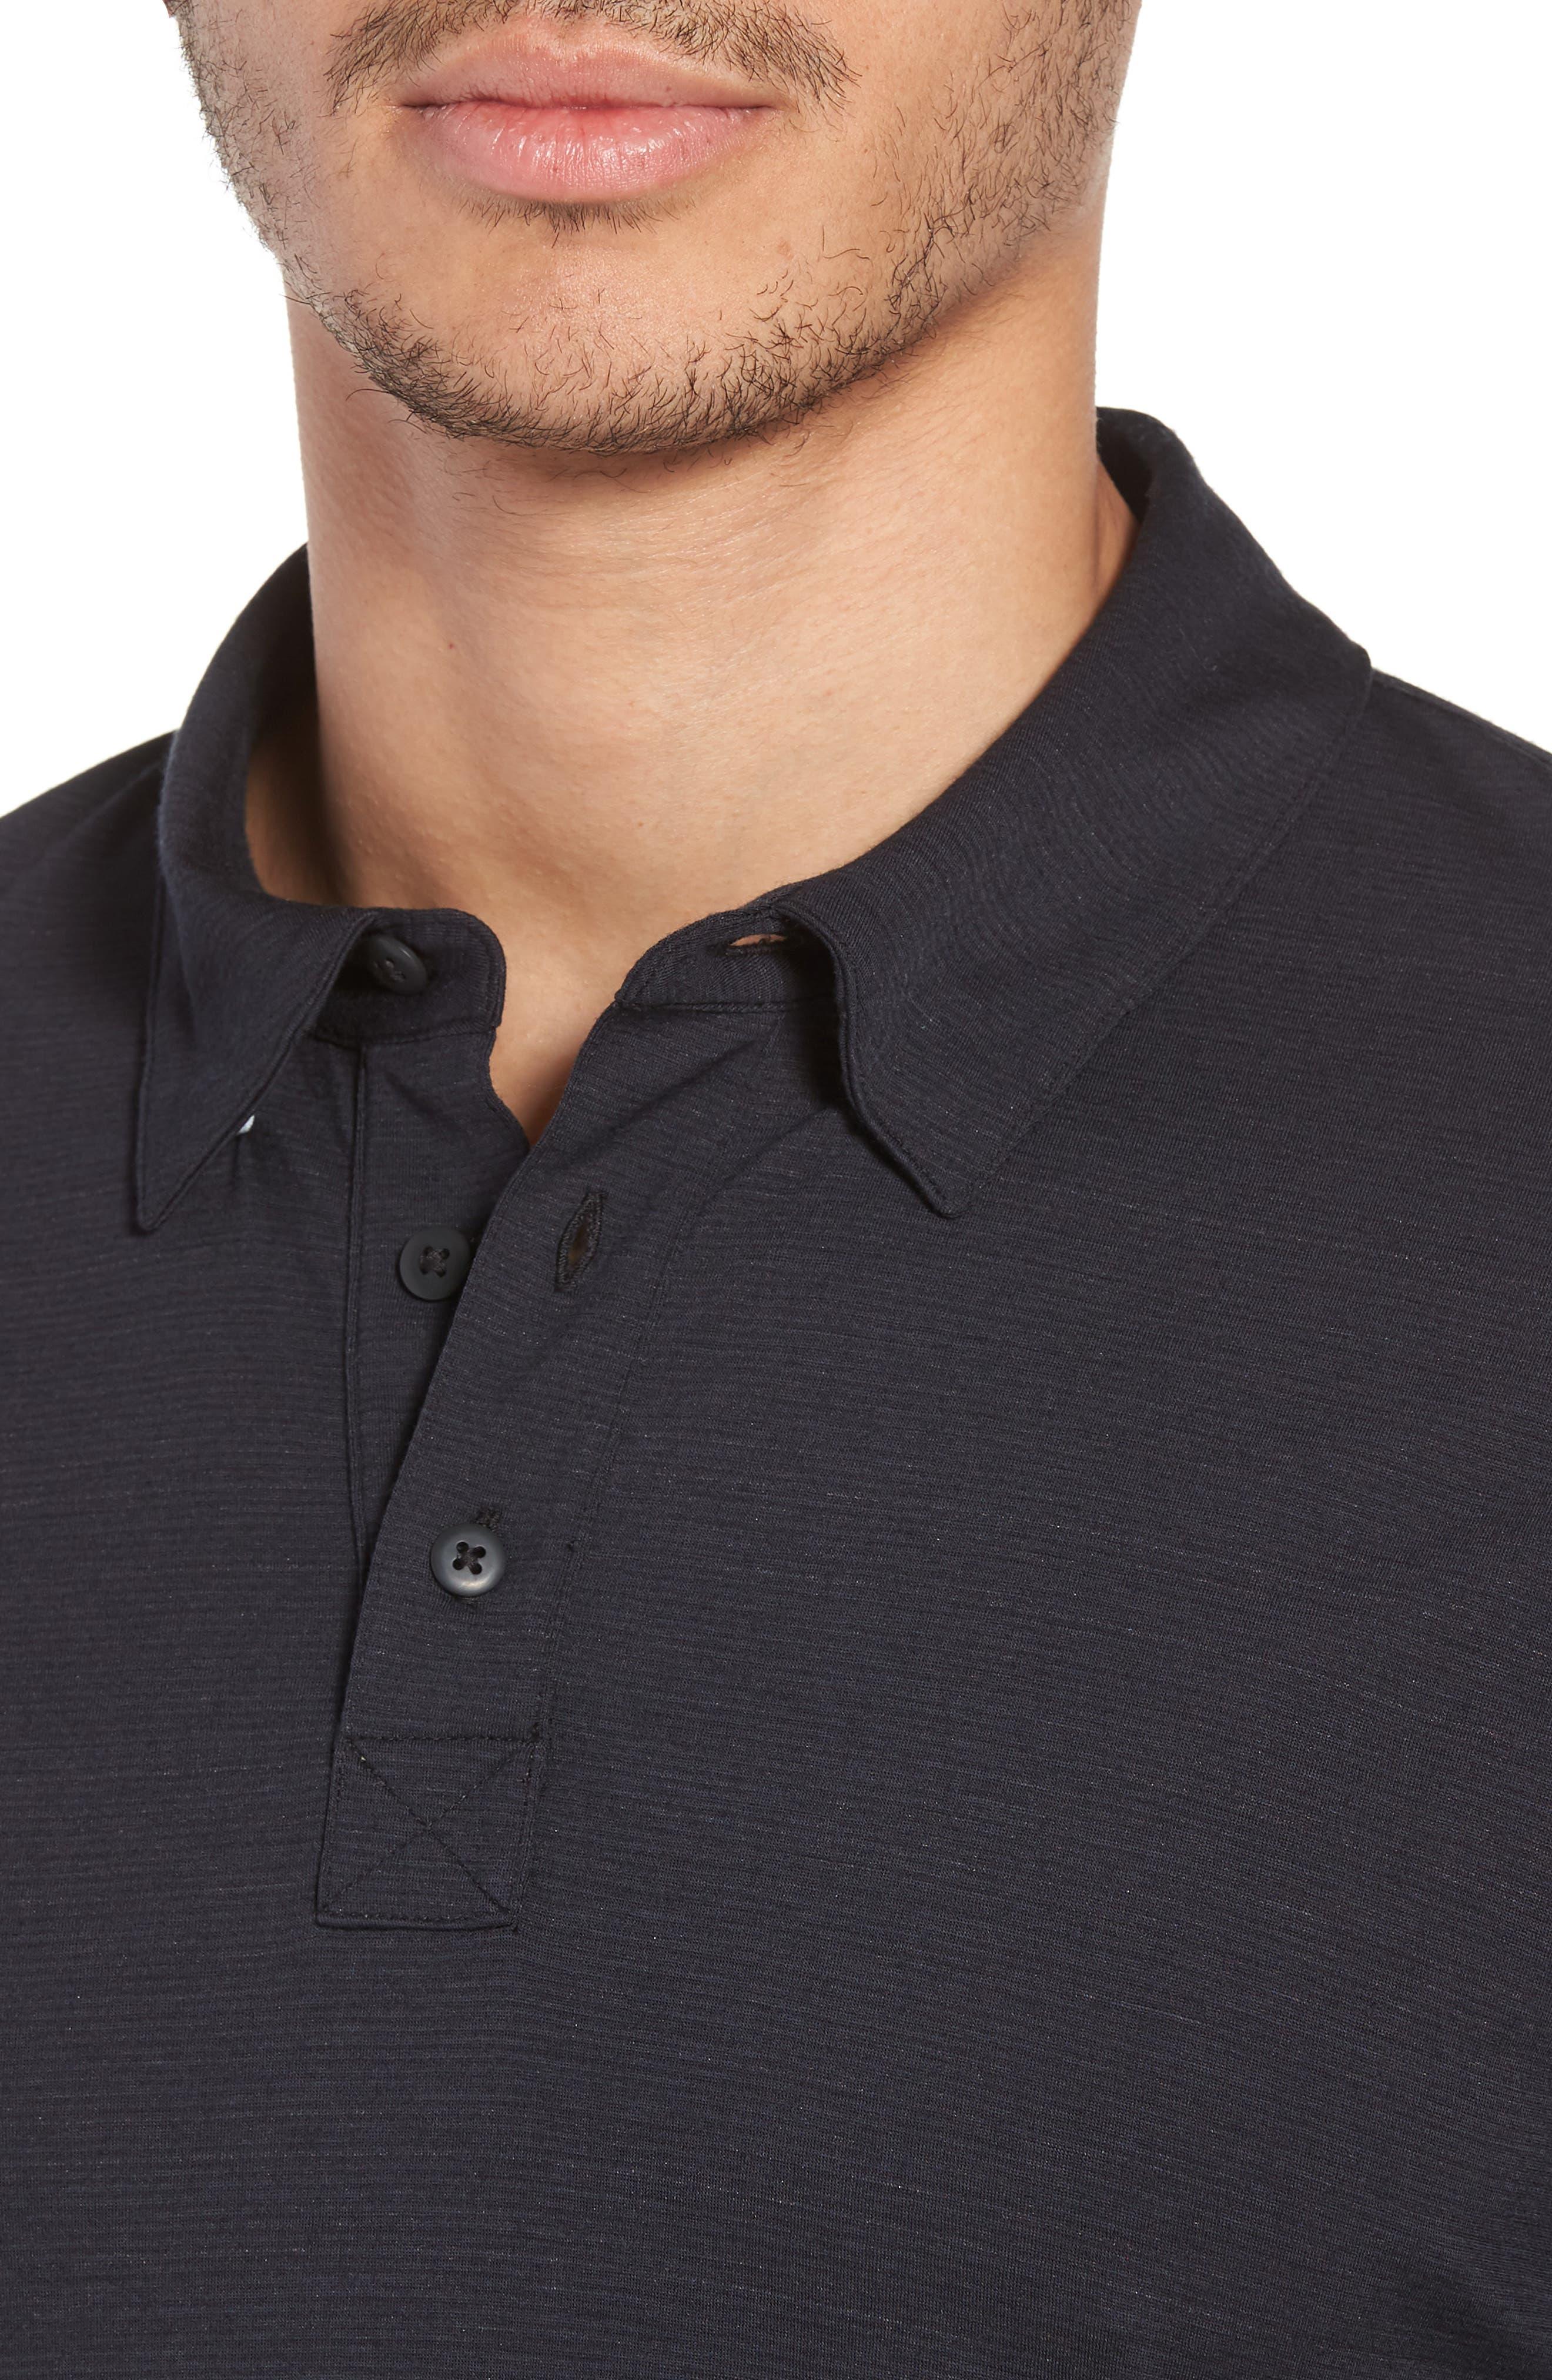 Merino 150 Wool Blend Polo Shirt,                             Alternate thumbnail 4, color,                             Charcoal